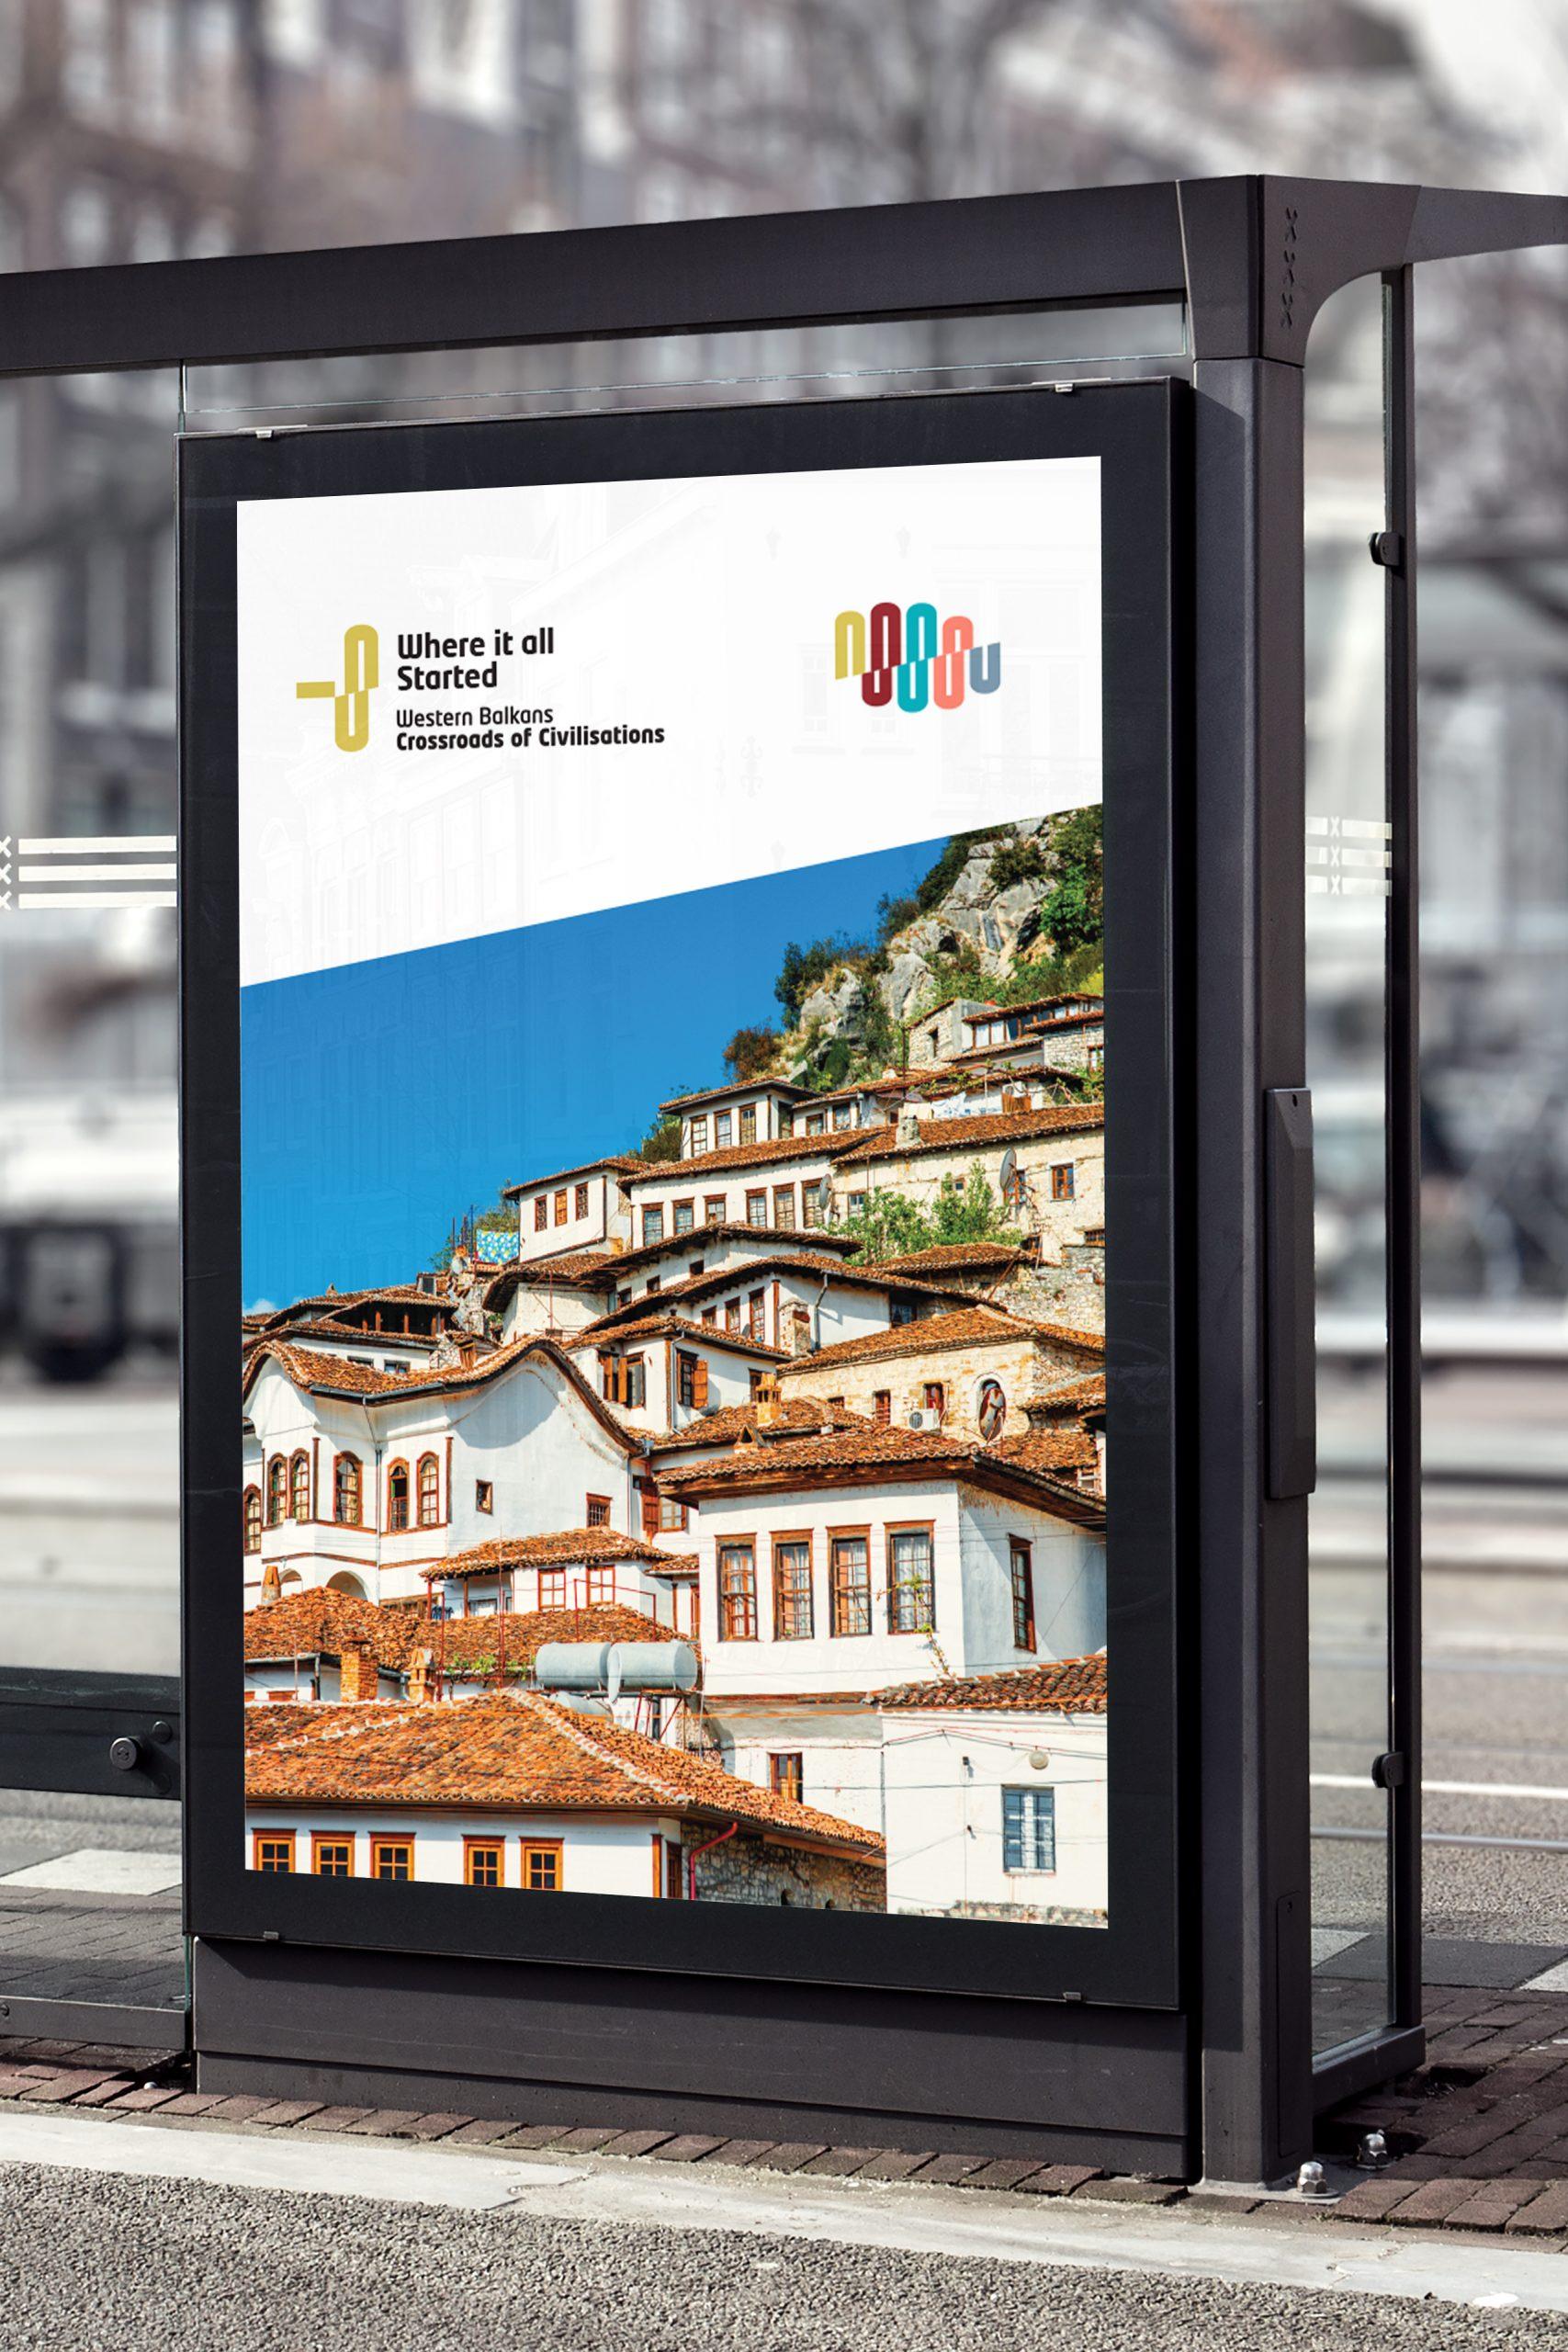 Western Balkans Crossroads of Civilisations, Project Img 14 - Vatra Agency / Founder & CEO Gerton Bejo